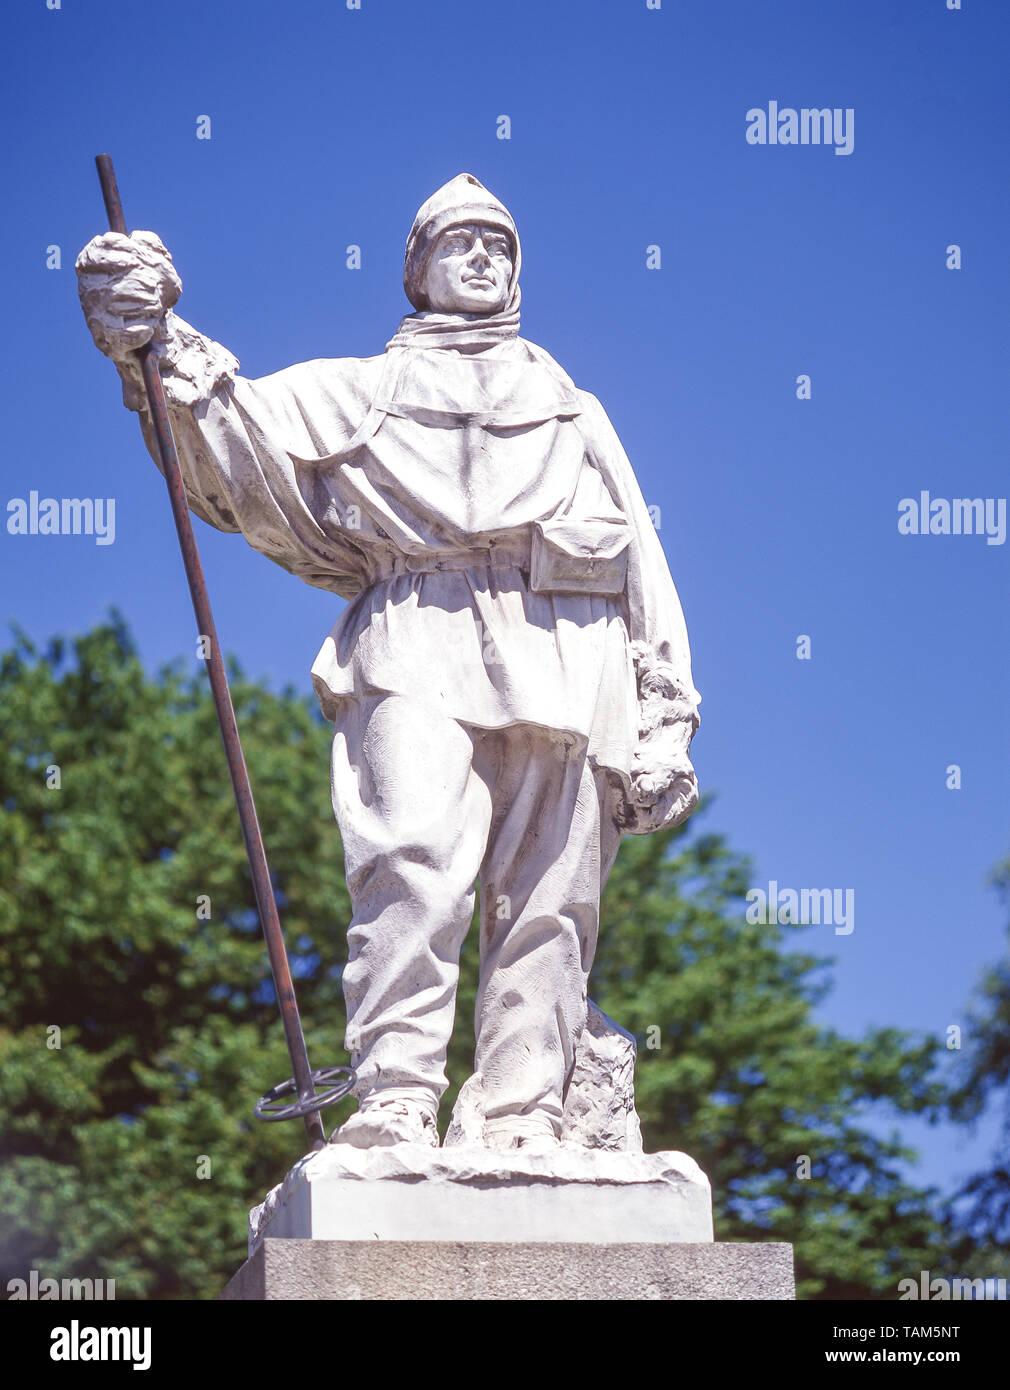 Robert Falcon Scott statue, Worcester Street, Christchurch, Canterbury Region, New Zealand - Stock Image